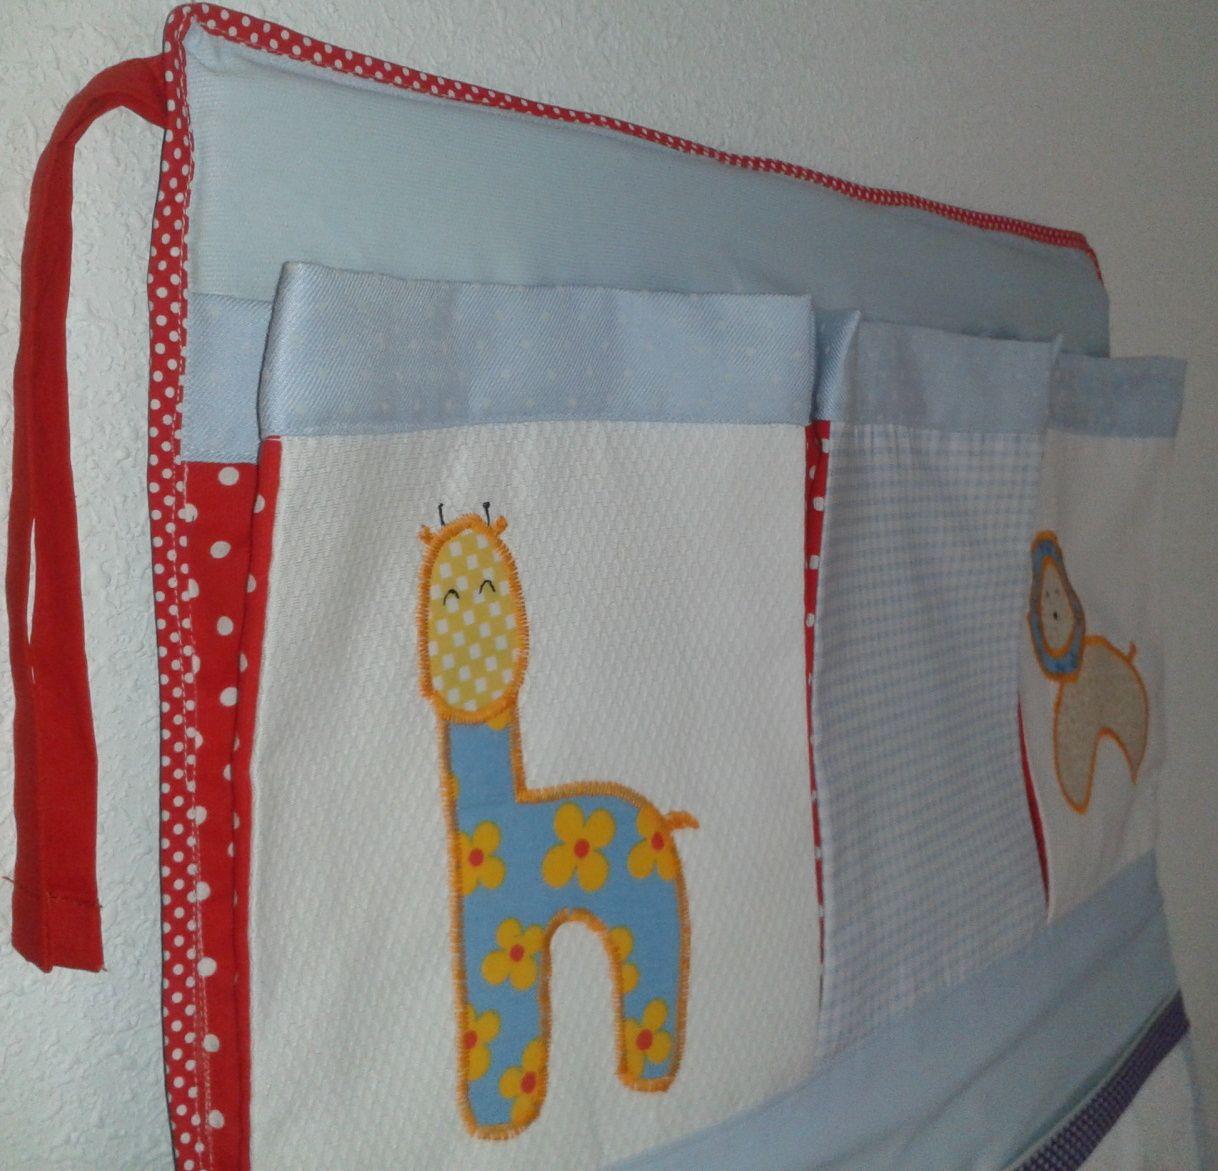 Tutorial bolsillero para cuna de beb organizador para cuna de beb costura hecha por m - Organizador de cuna ...